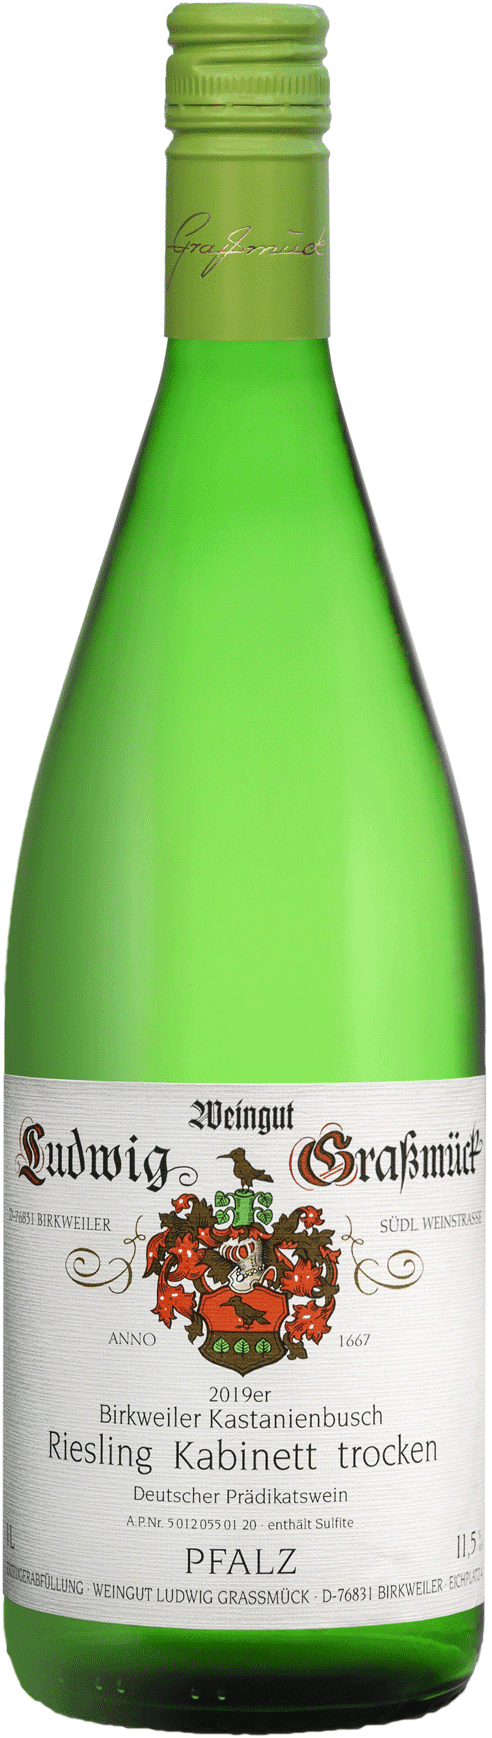 Weingut Ludwig Graßmück, Simon Graßmück, Birkweiler Kastanienbusch Riesling Kabinett trocken 2019